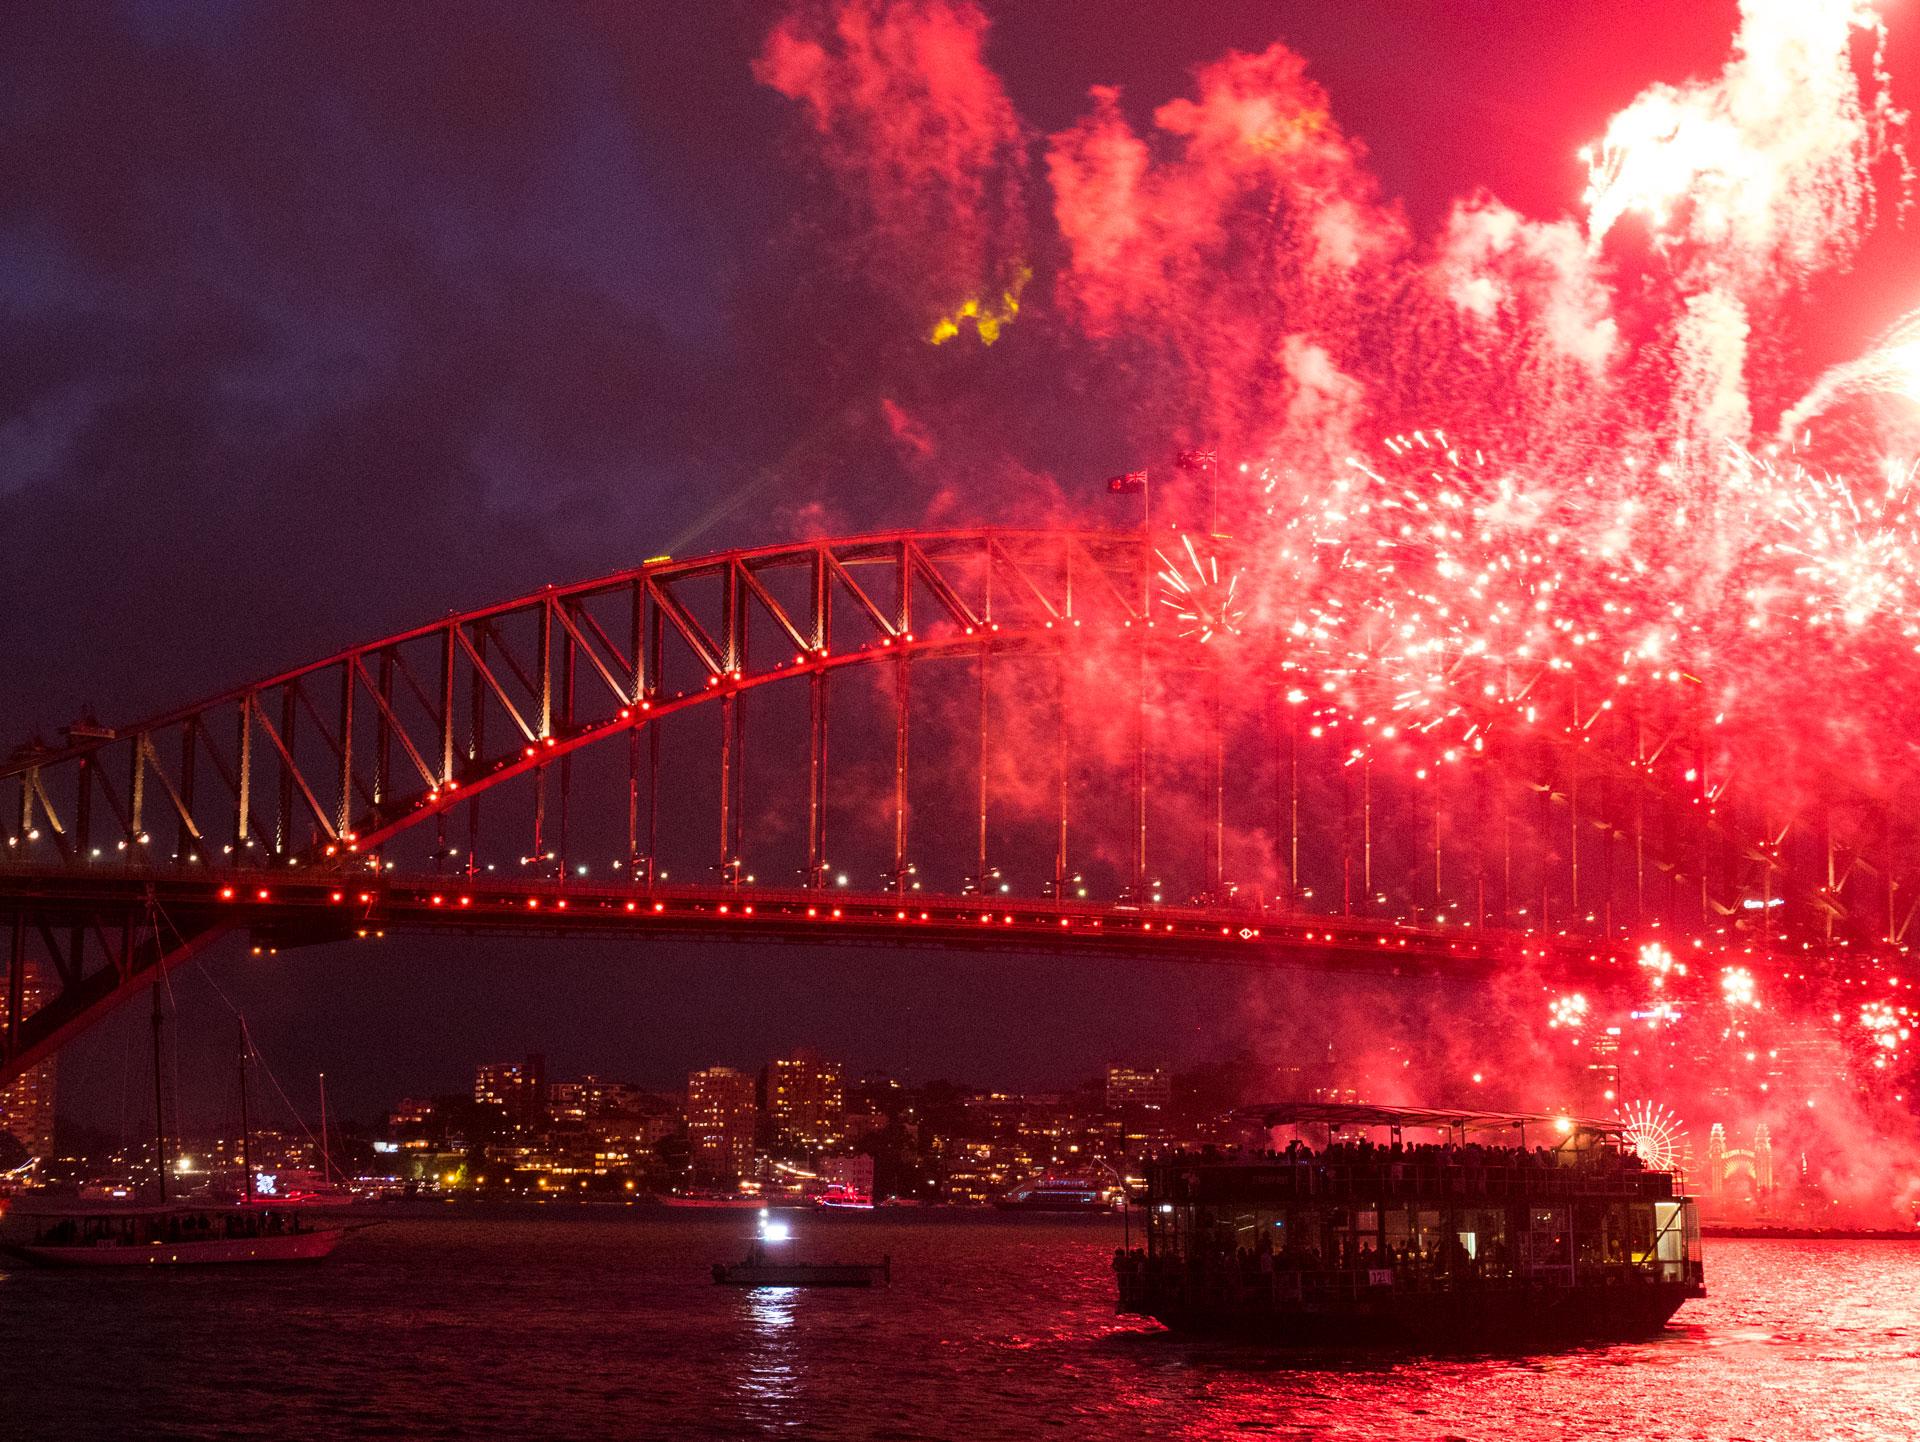 Silvester in Sydney 2017